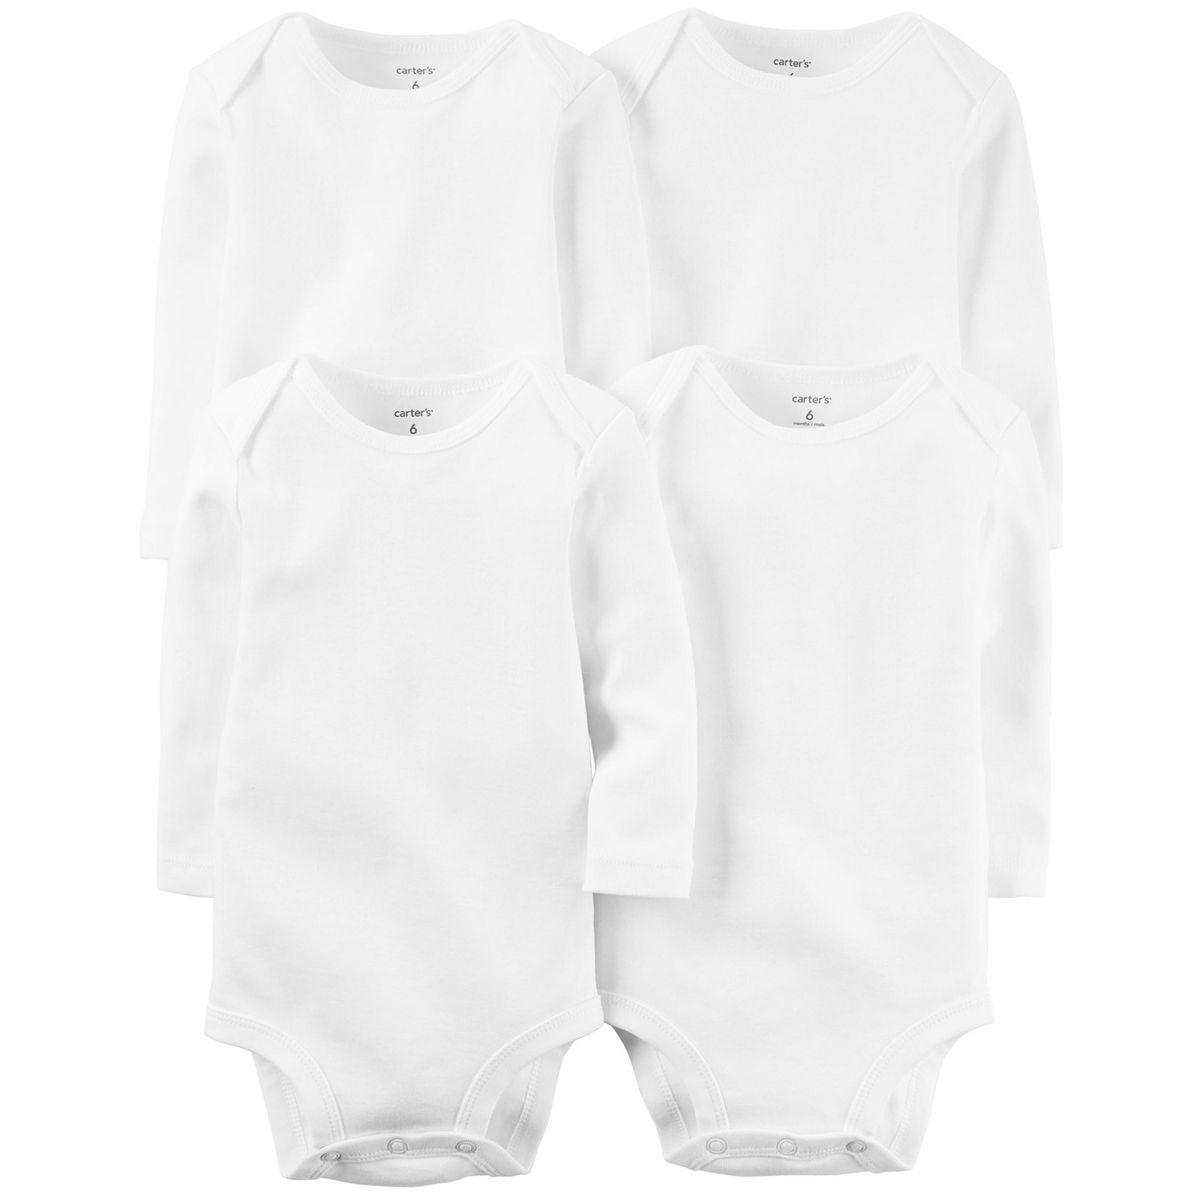 Baby Carter's Solid Bodysuits